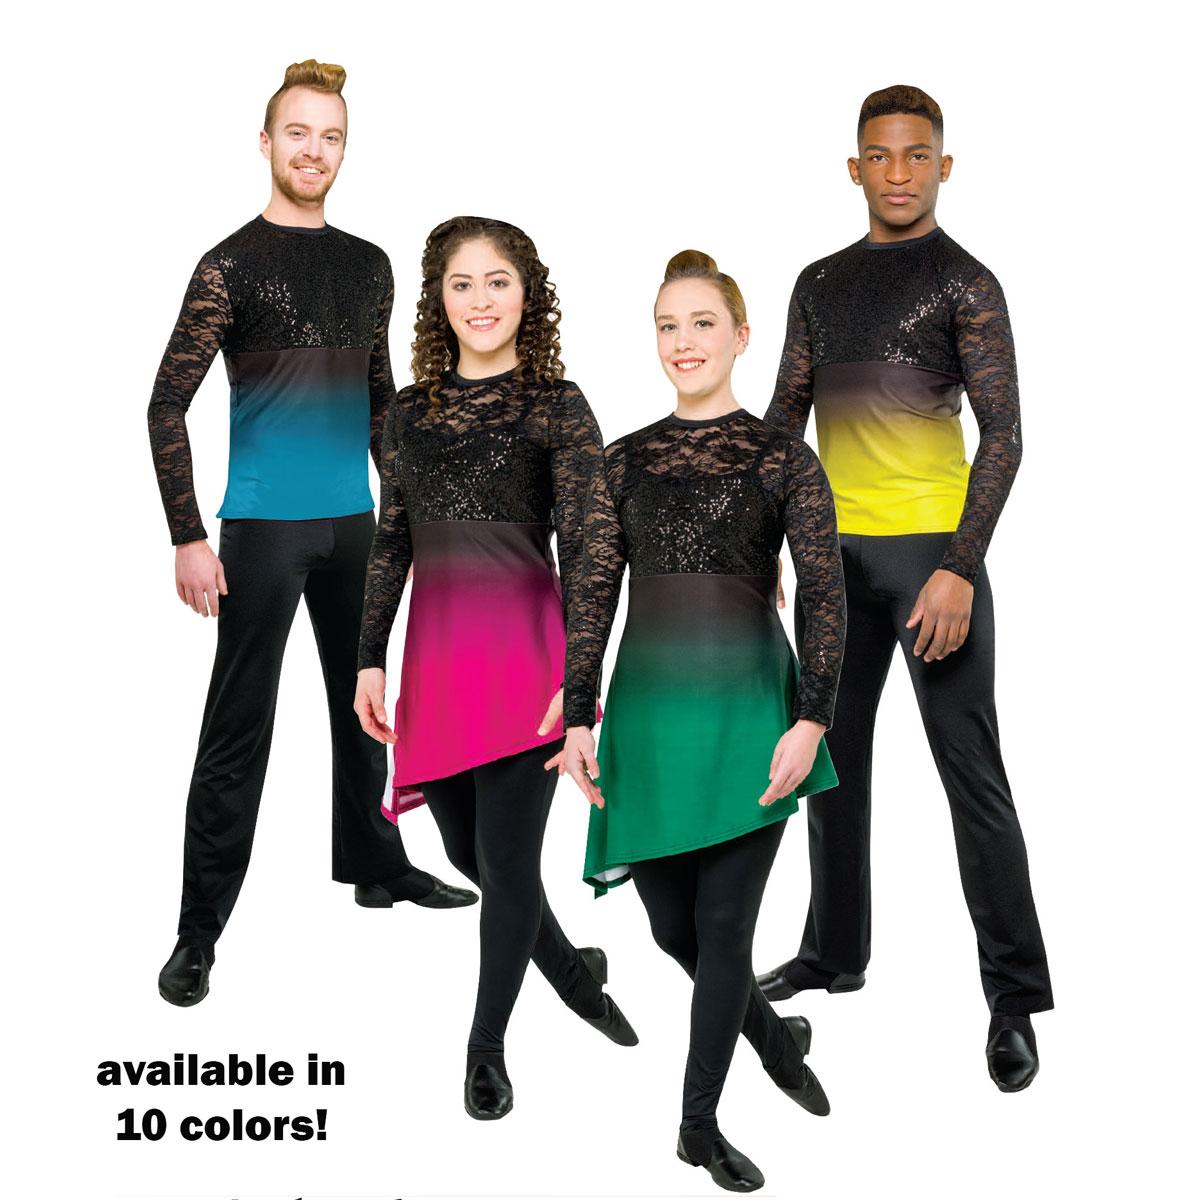 Guard Uniforms: Style 16034/16035